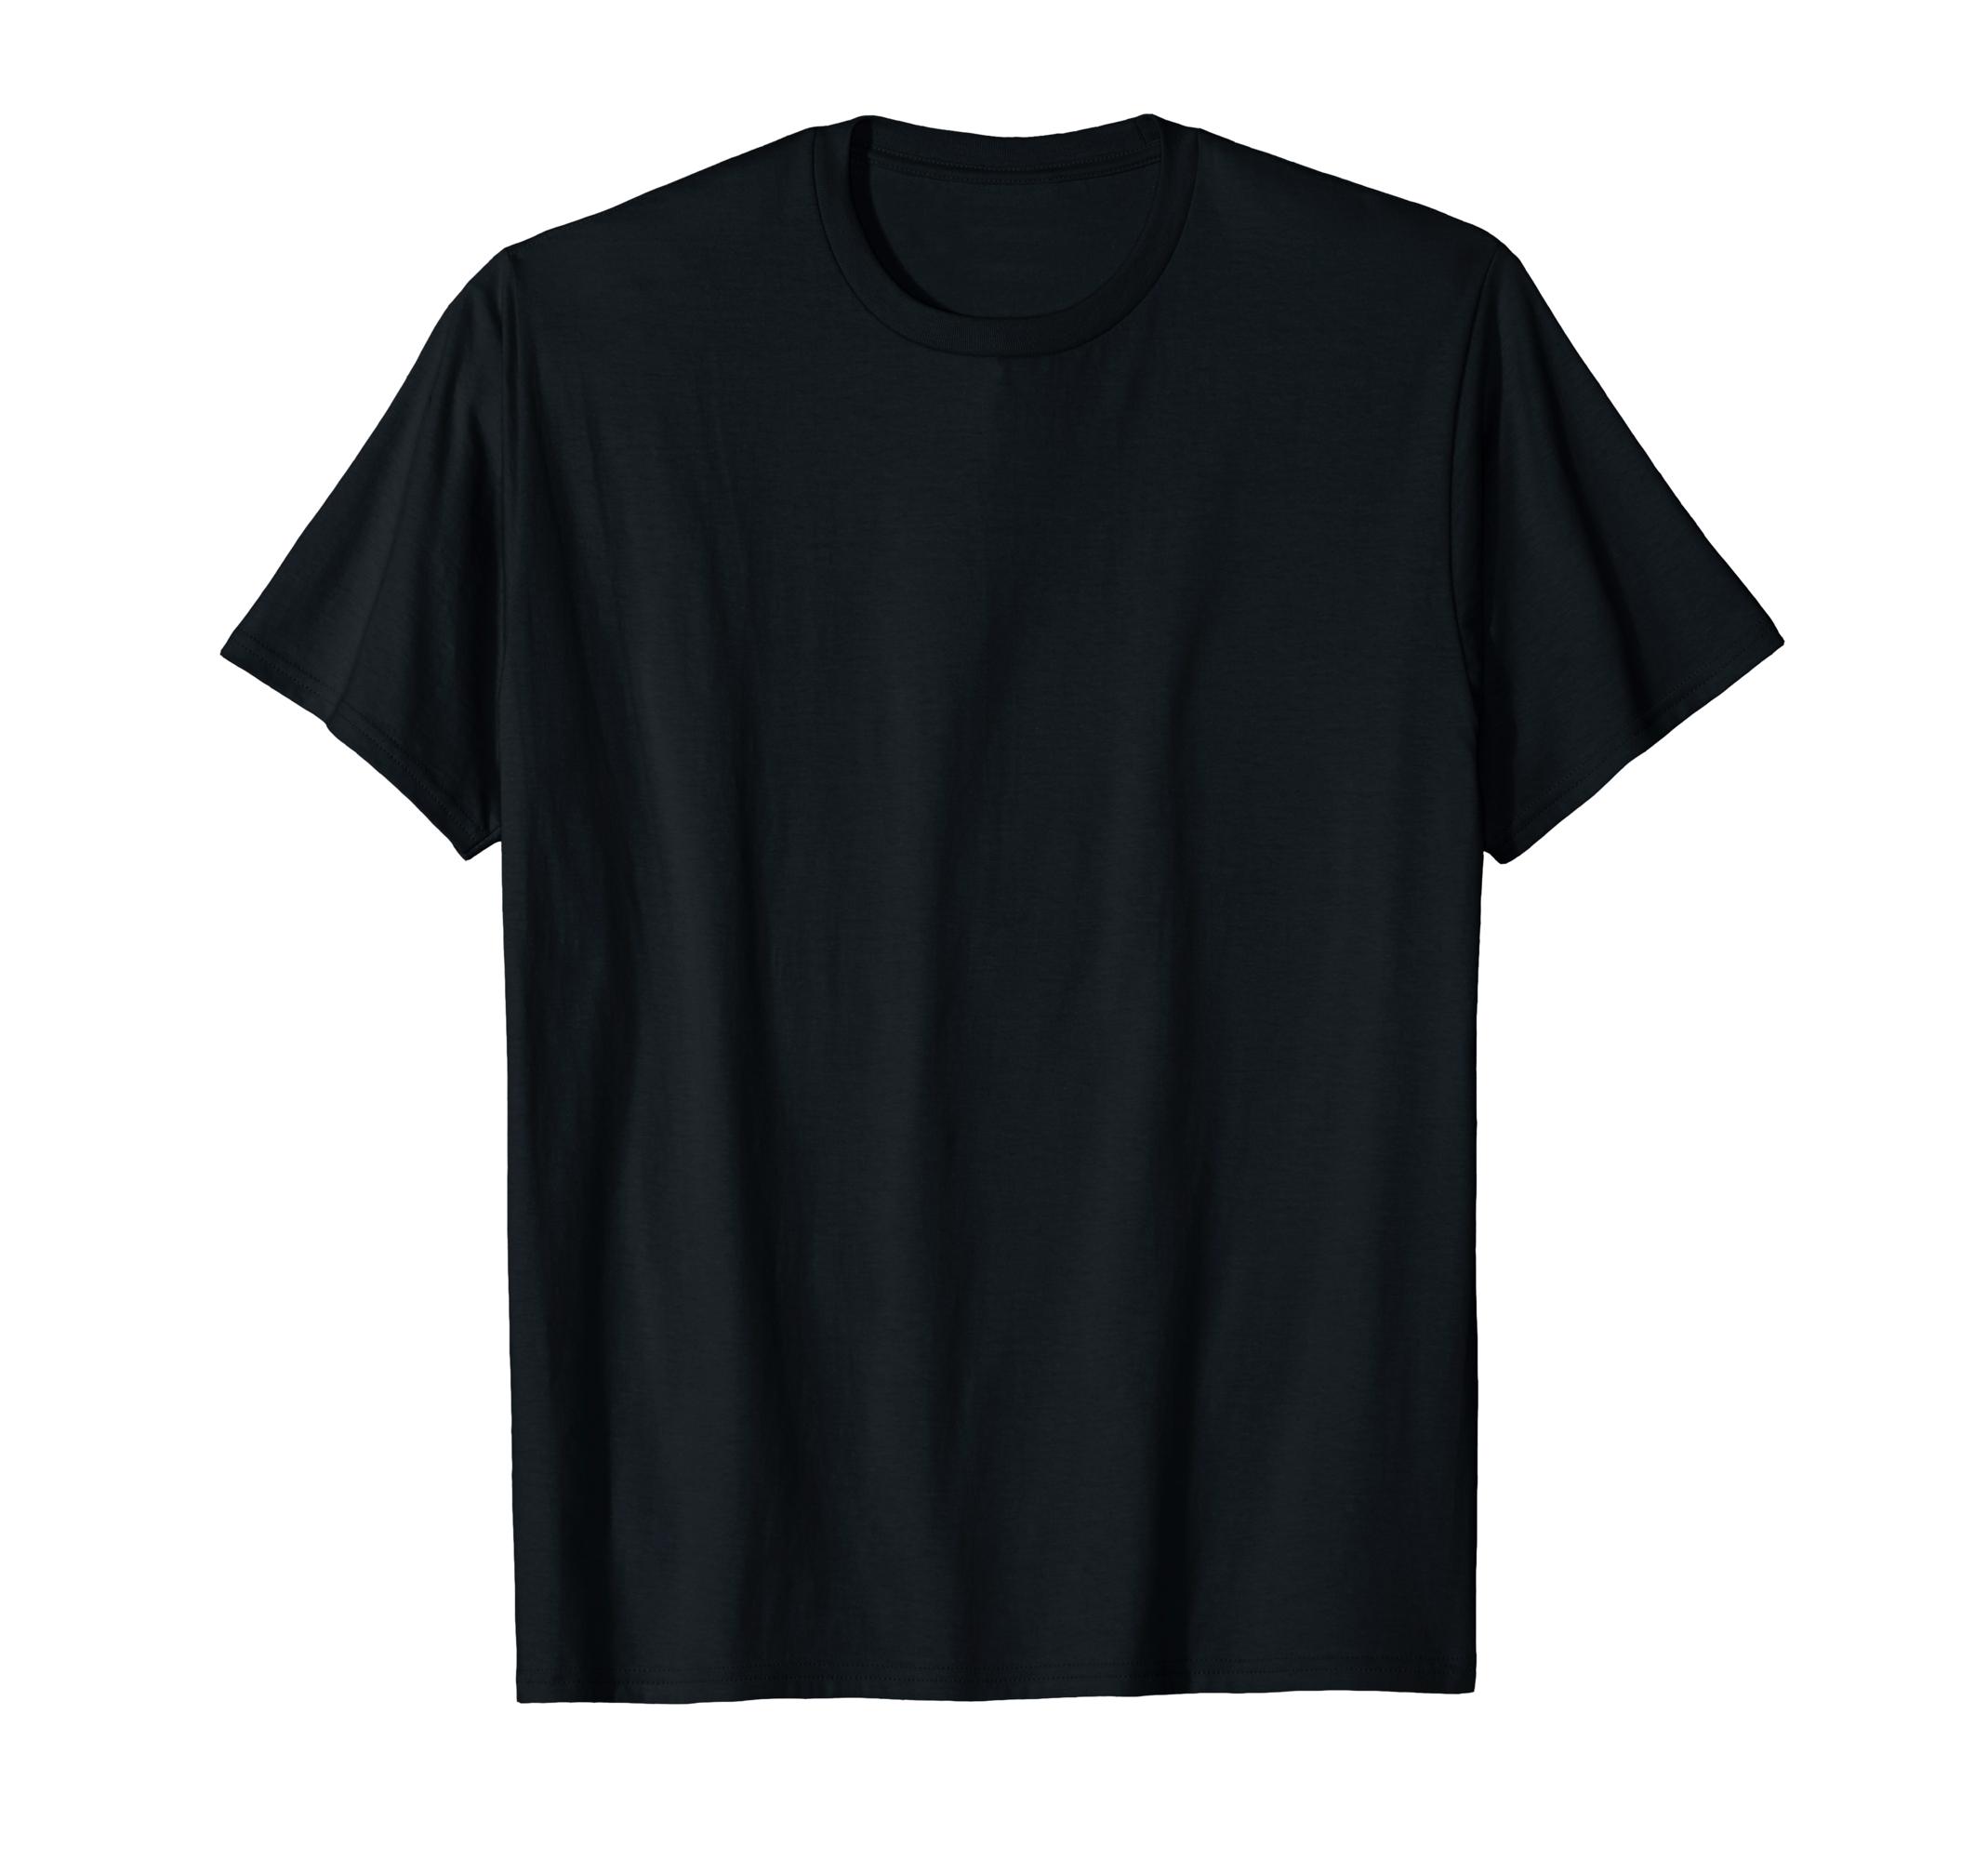 Printed Men T Shirt Cotton Tshirt O-neck Short-sleeve New Style Pearl Is So Gay Funny Women T-shirt T-shirts